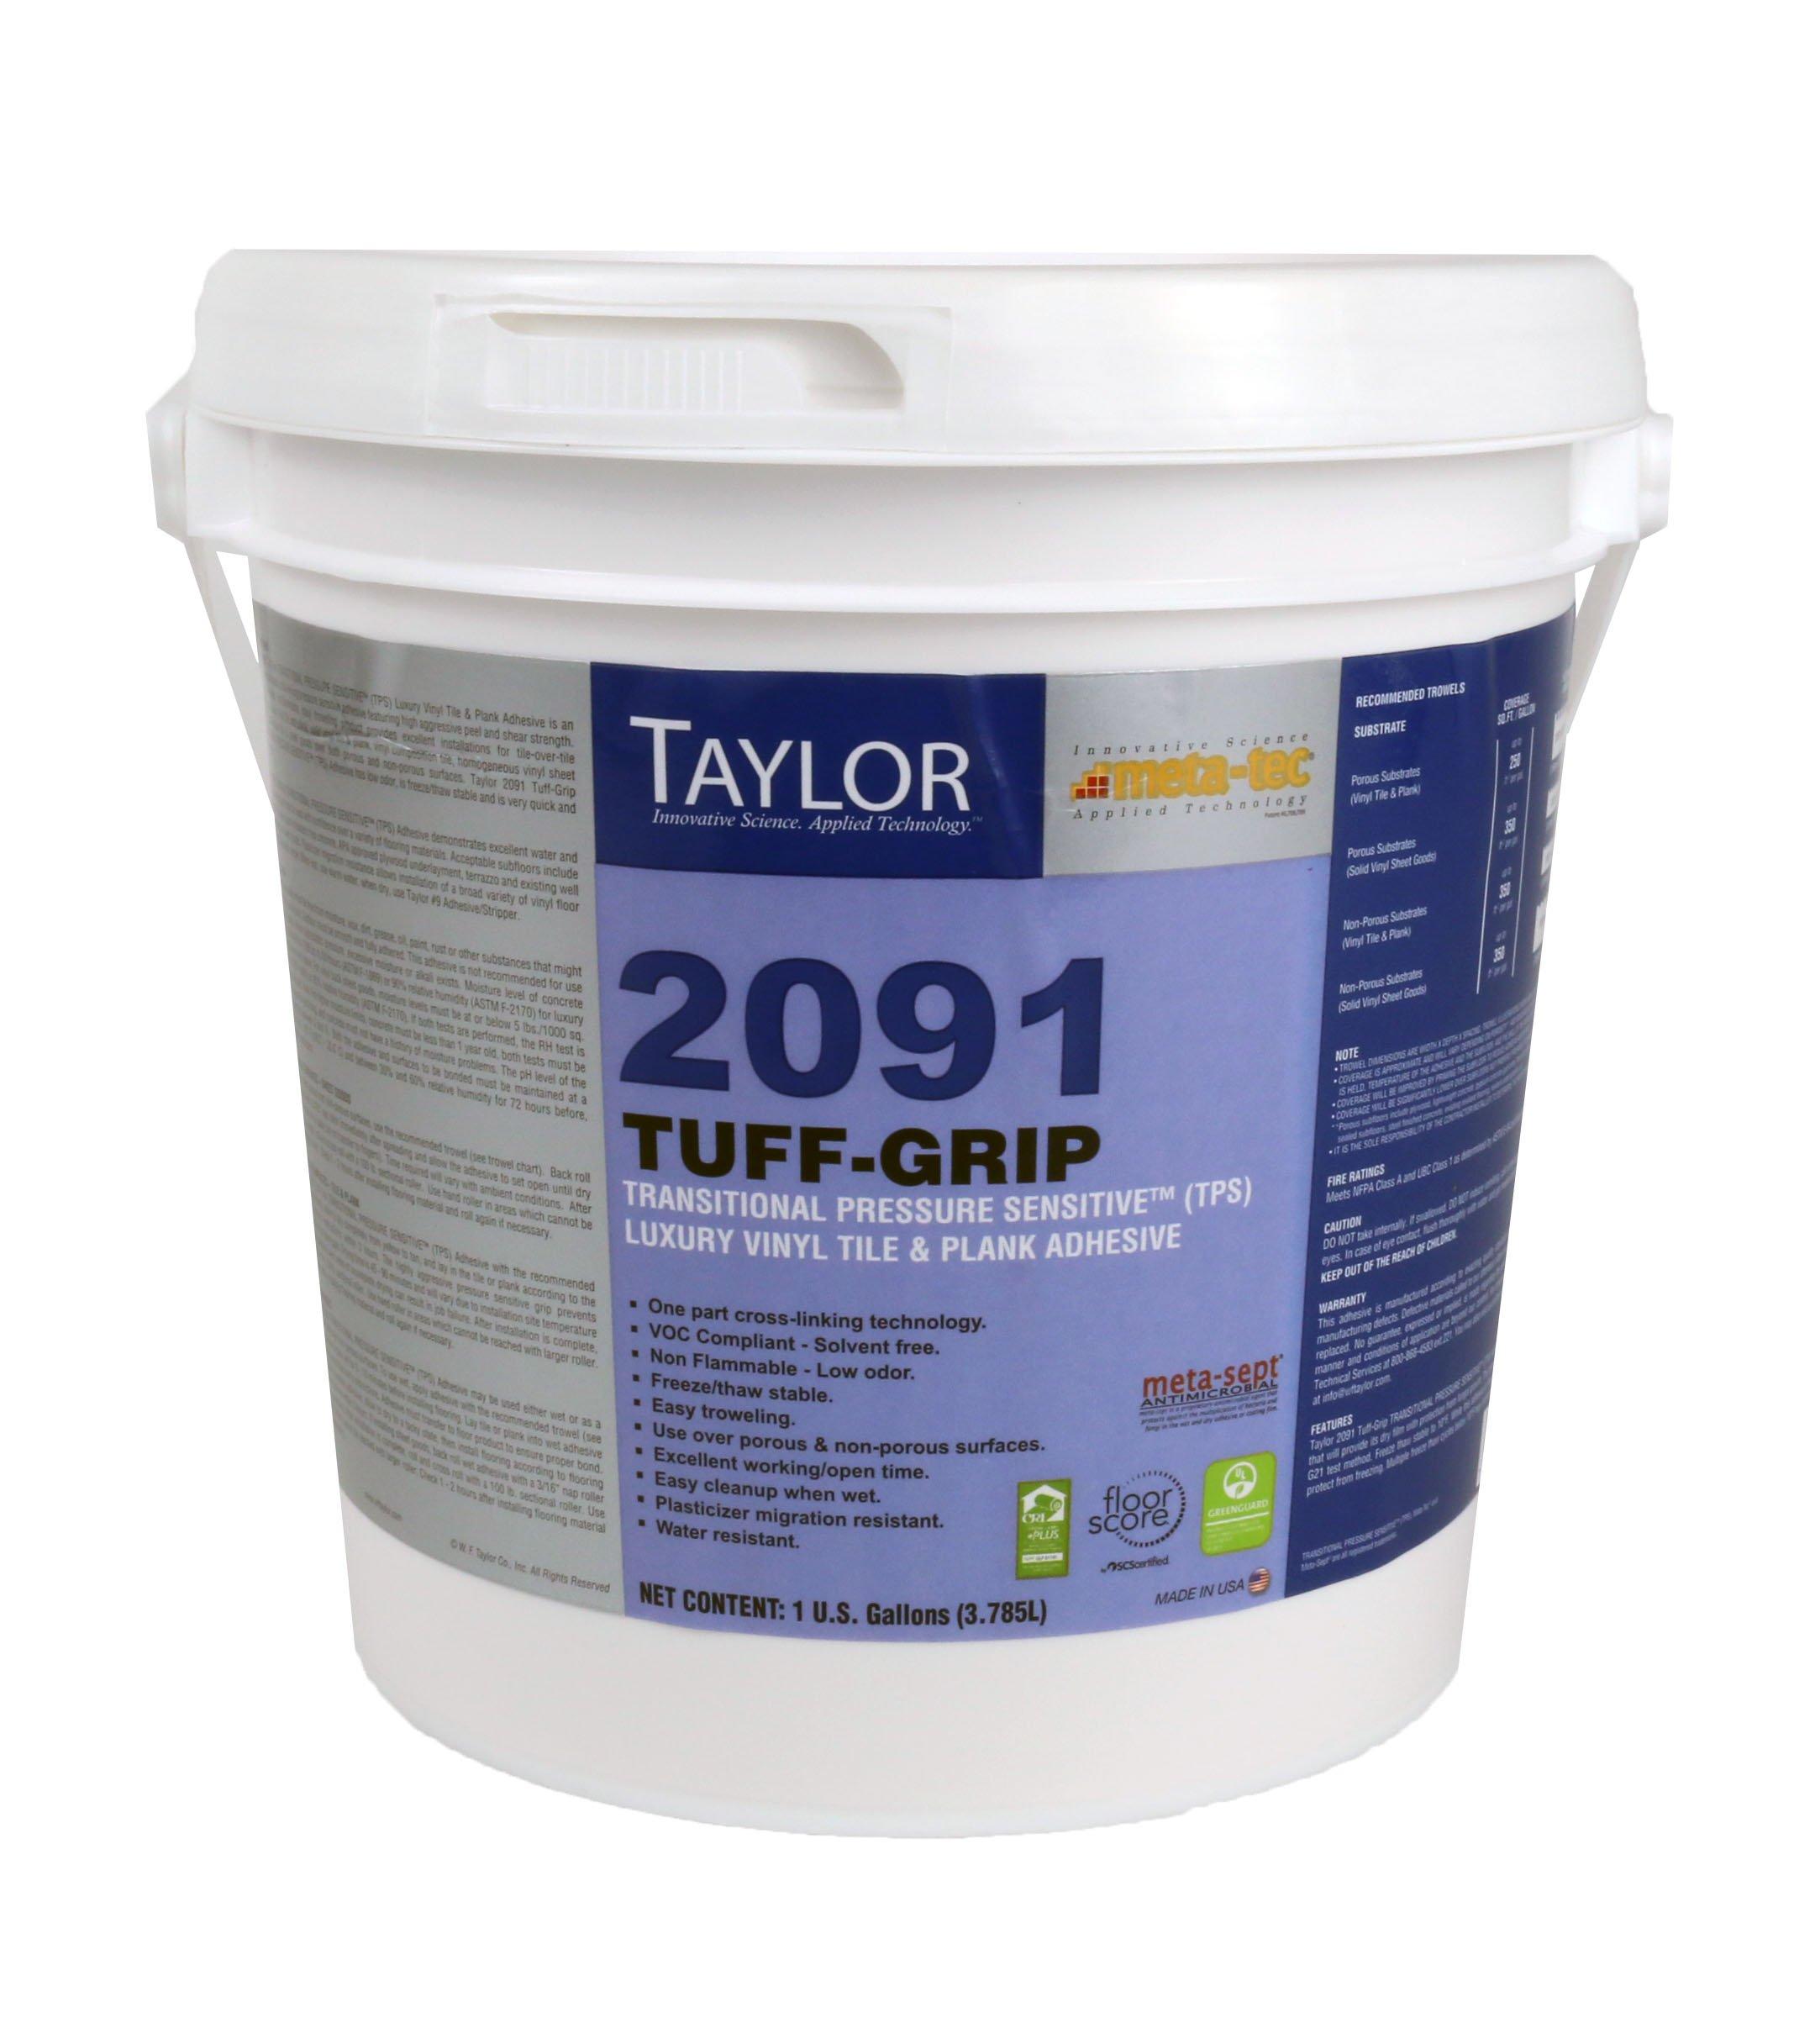 Taylor Meta-Tec 2091 Tuff-Grip Transitional Pressure Sensitive (TPS) Luxury Vinyl Tile & Plank Adhesive (1 Gallon)